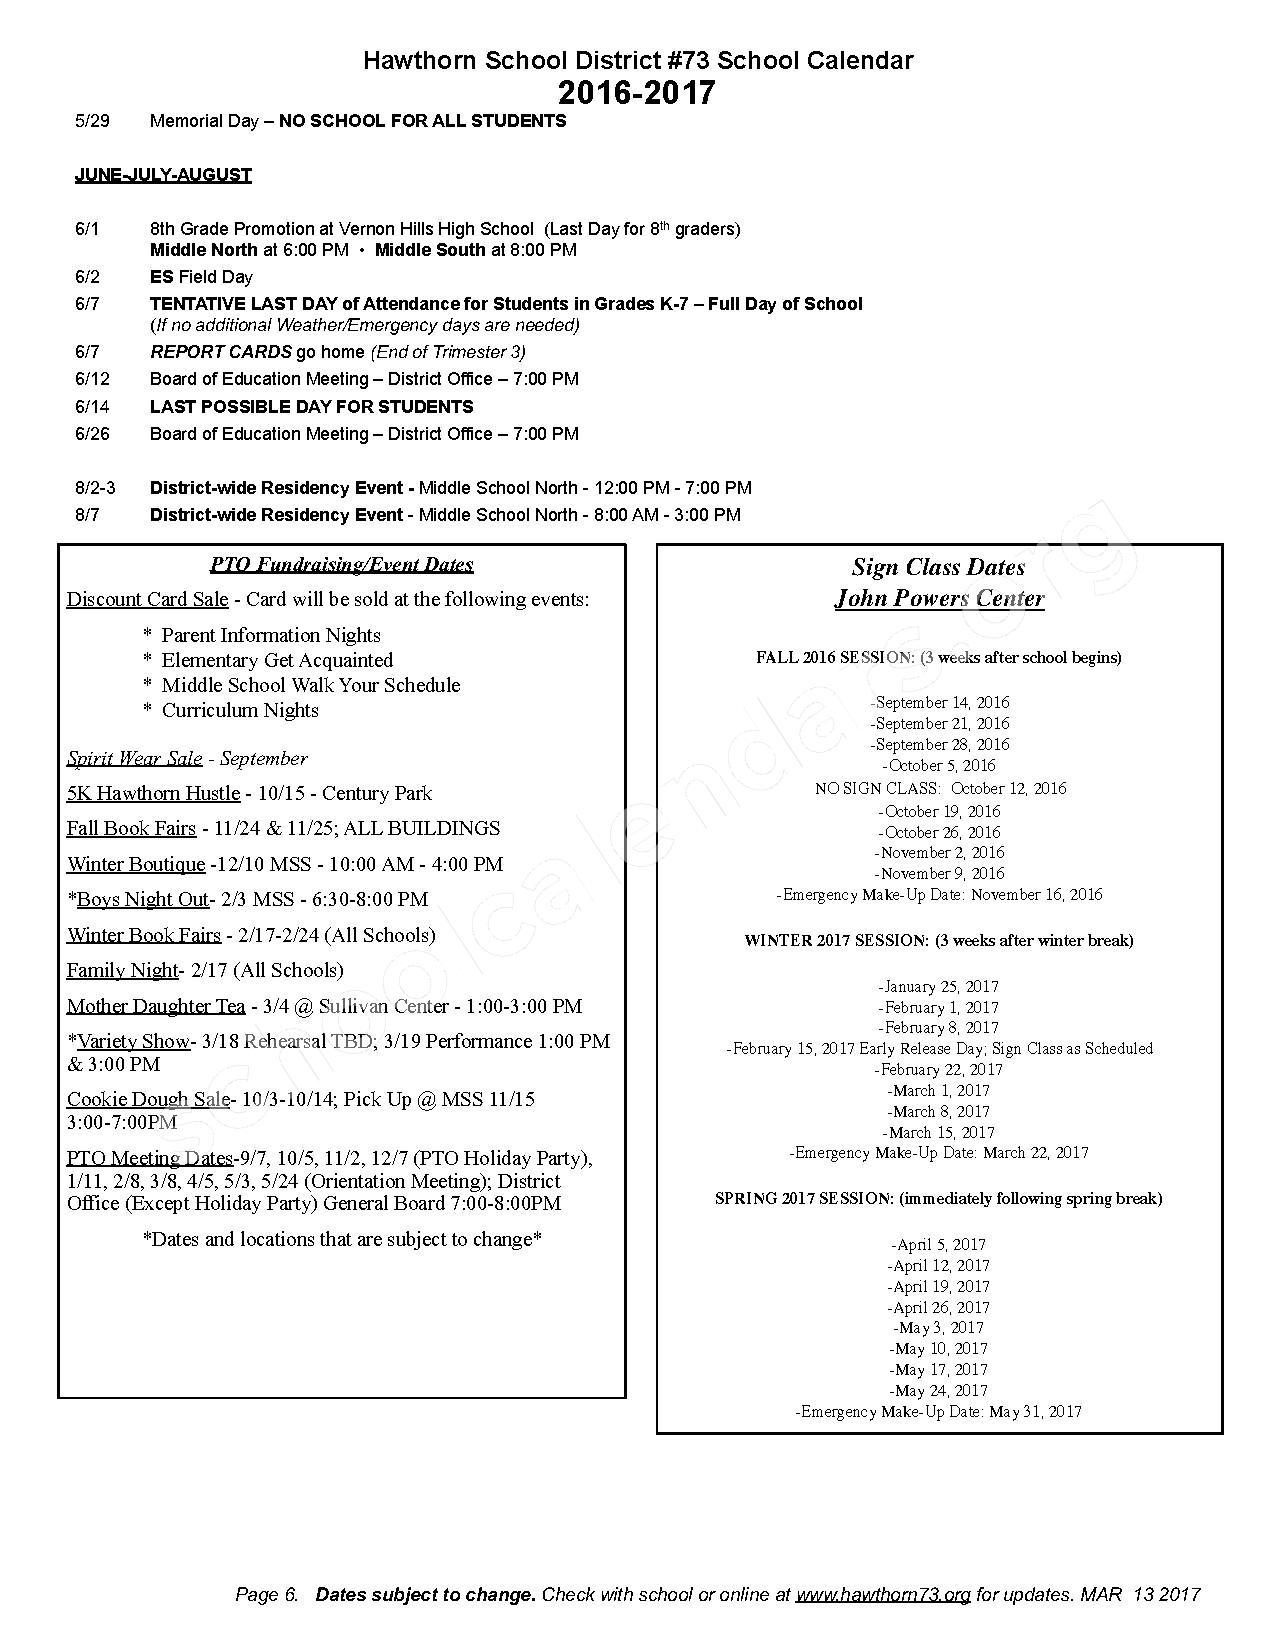 2016 - 2017 District Calendar – Hawthorn Aspen Elementary School – page 6